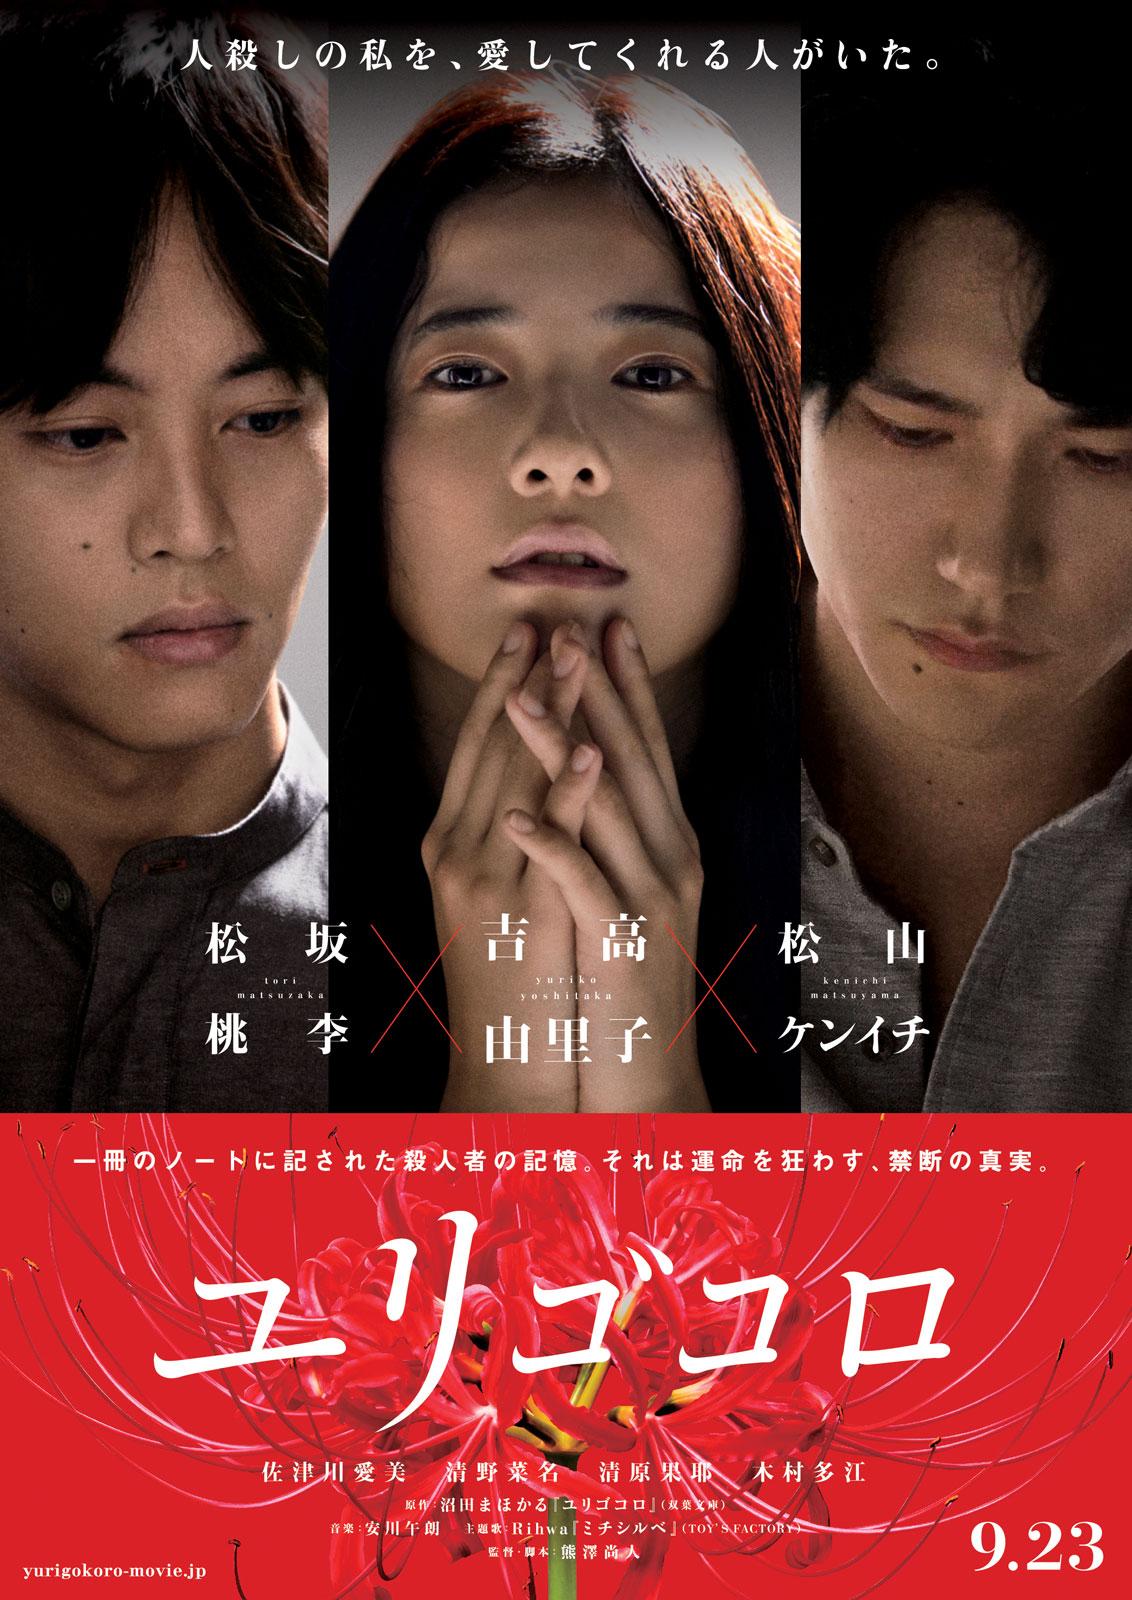 Image du film Yurigokoro